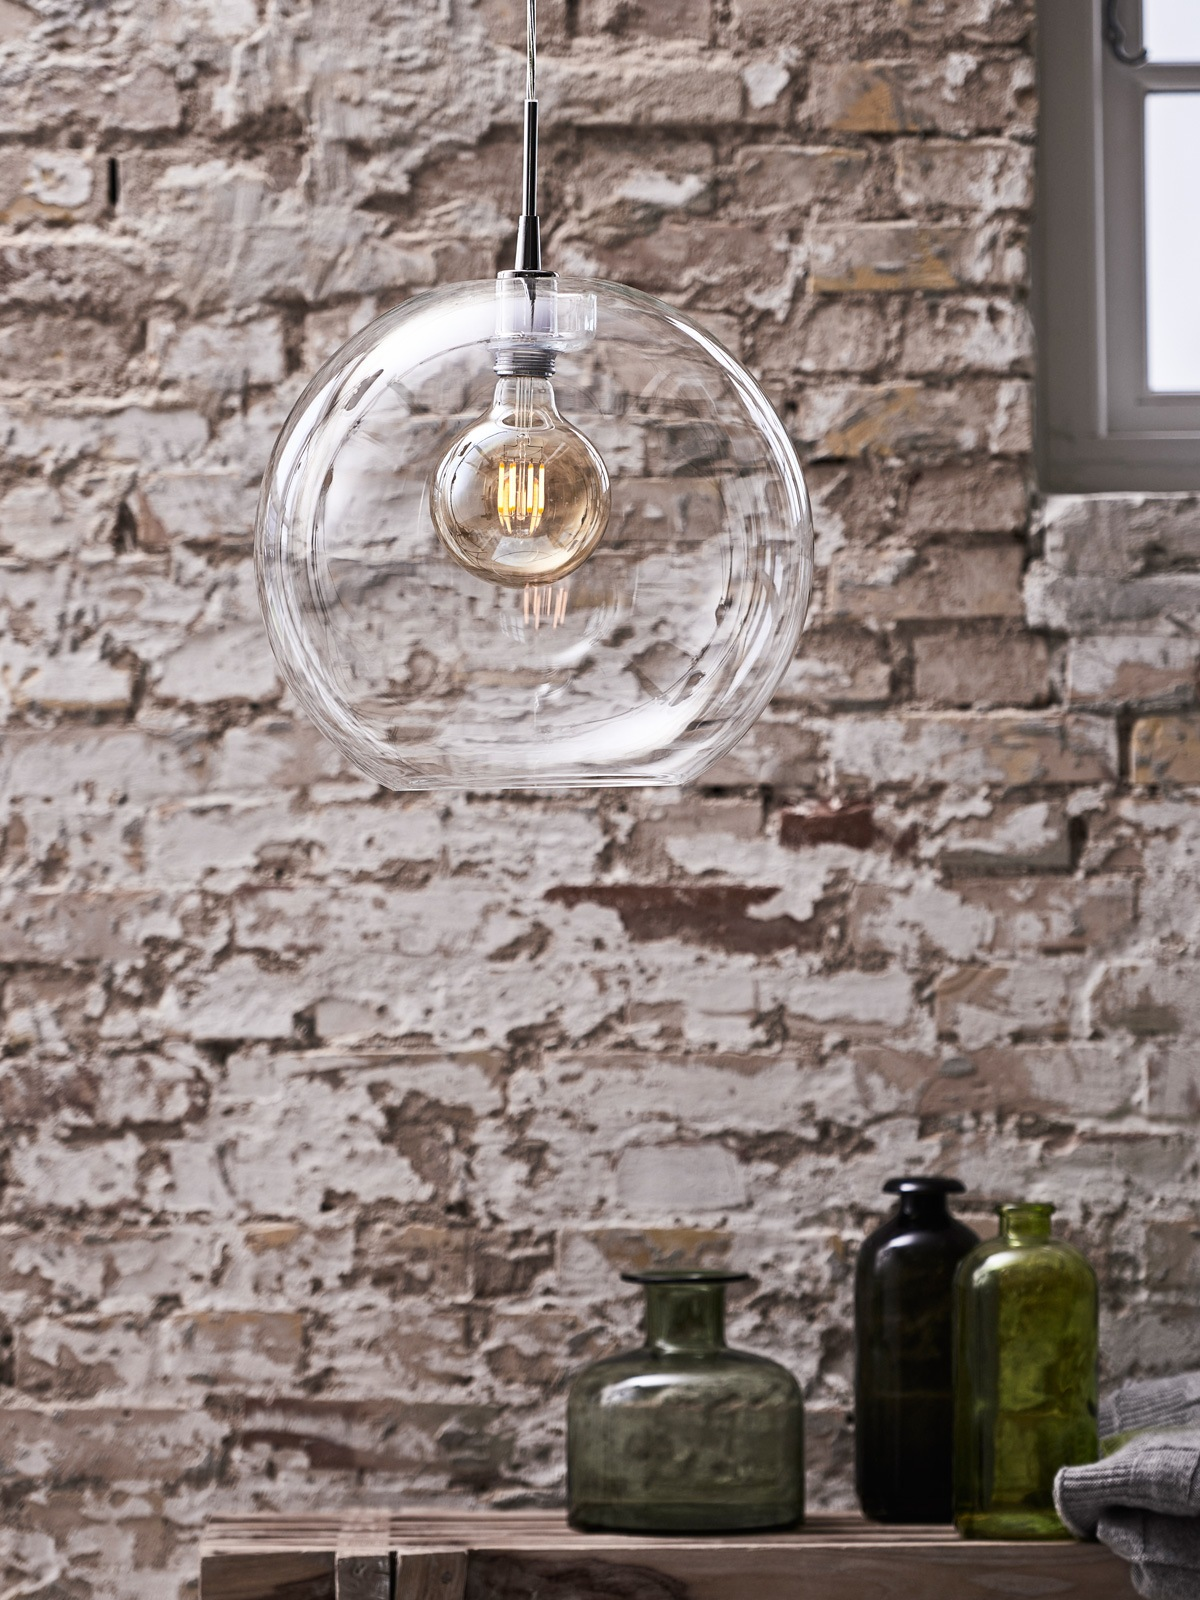 DesignOrt Blog: Gloria Klar Glasleuchte Belid DesignOrt Lampen Onlineshop Berlin